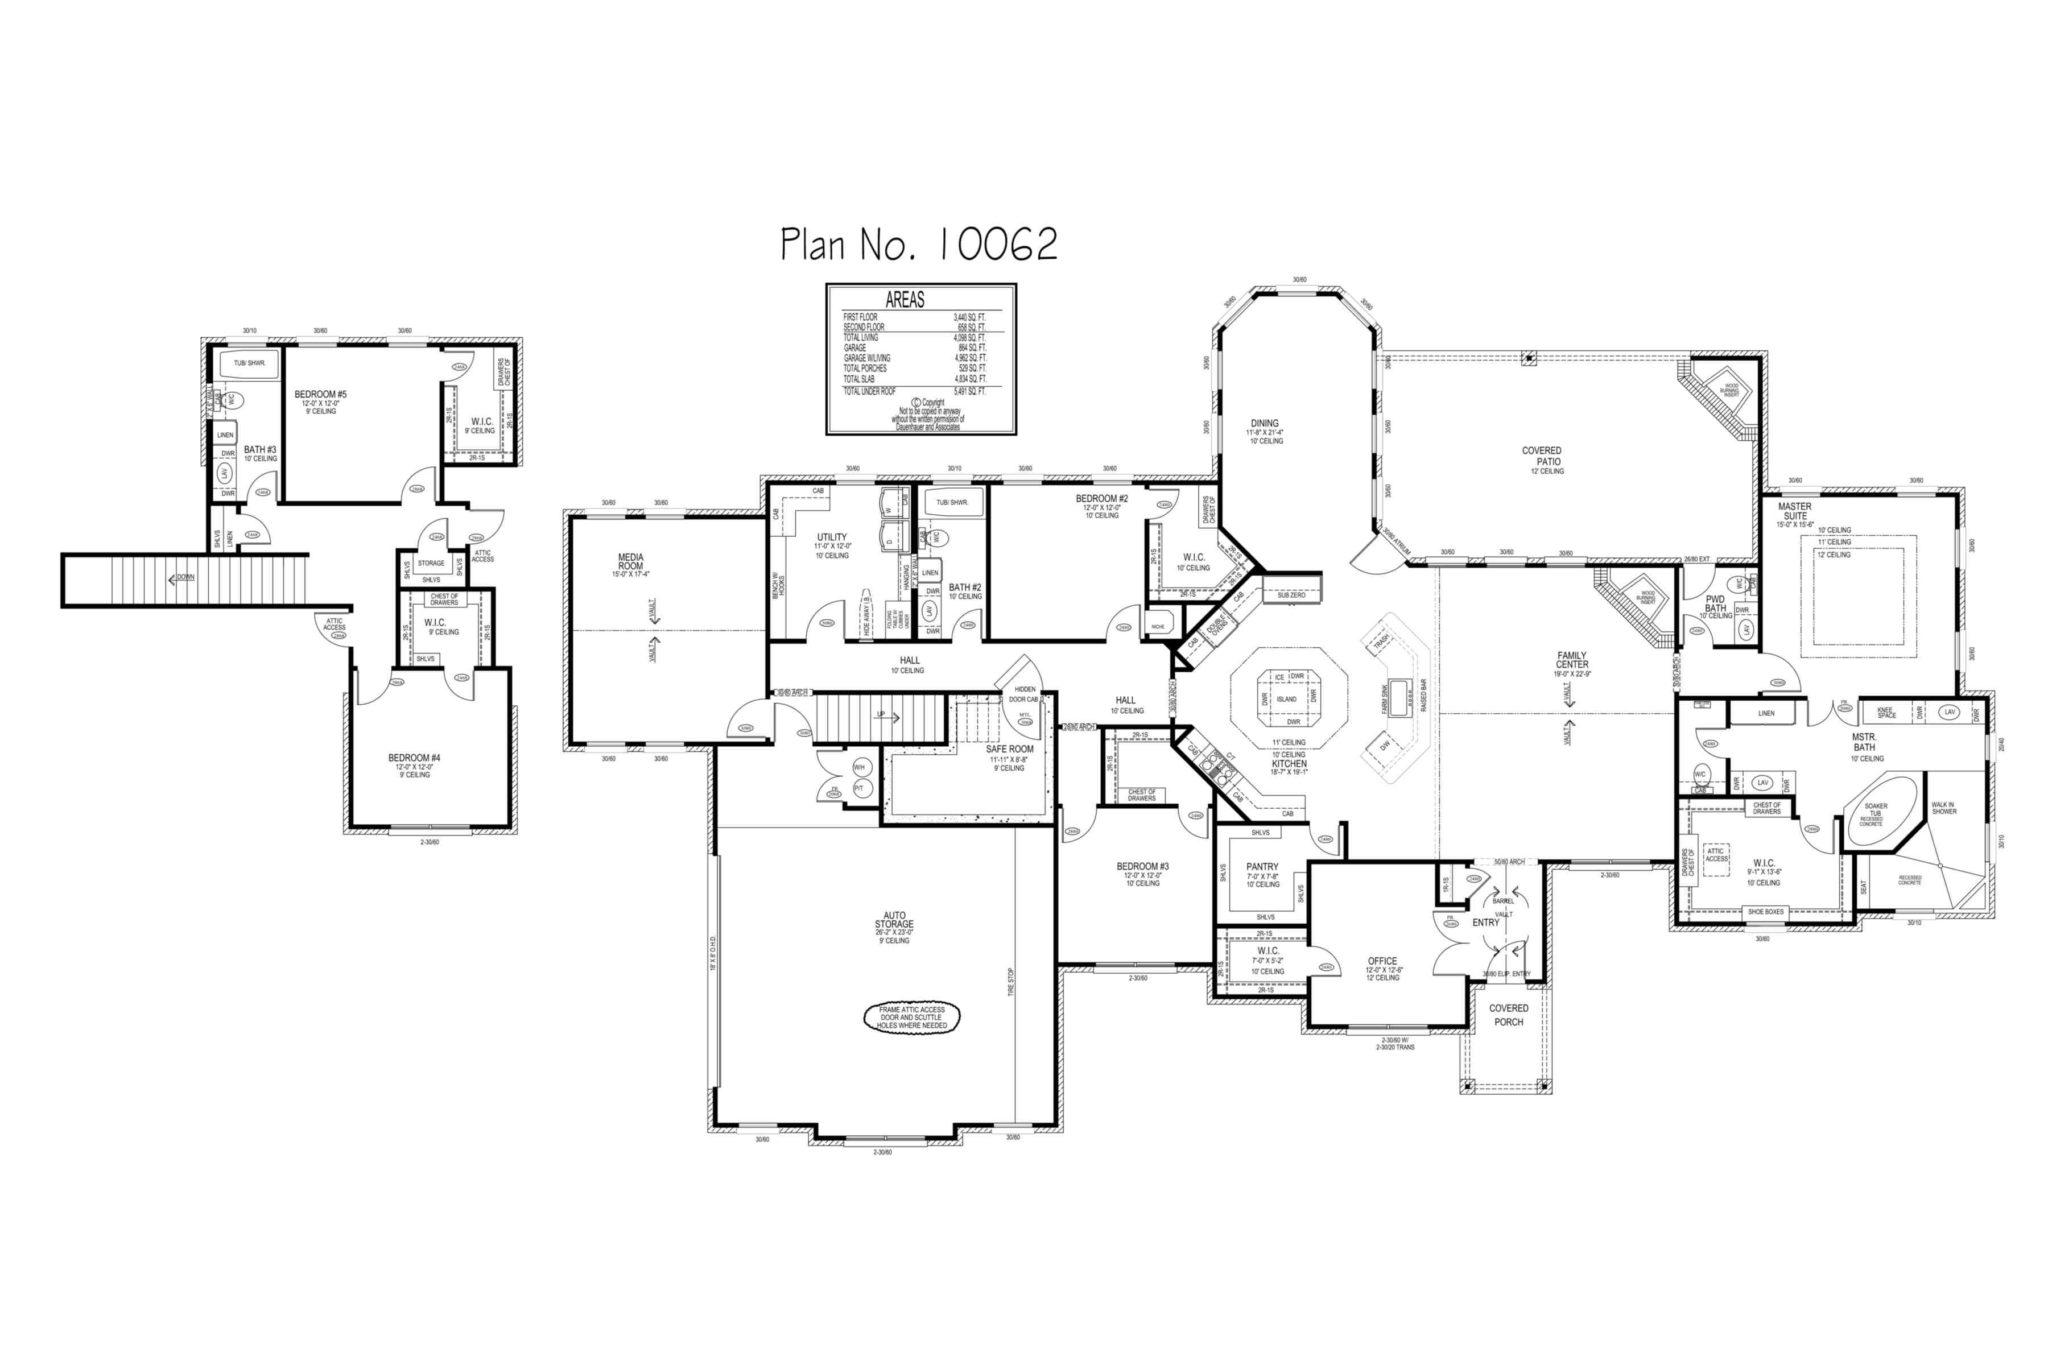 house-plan-10062-floor